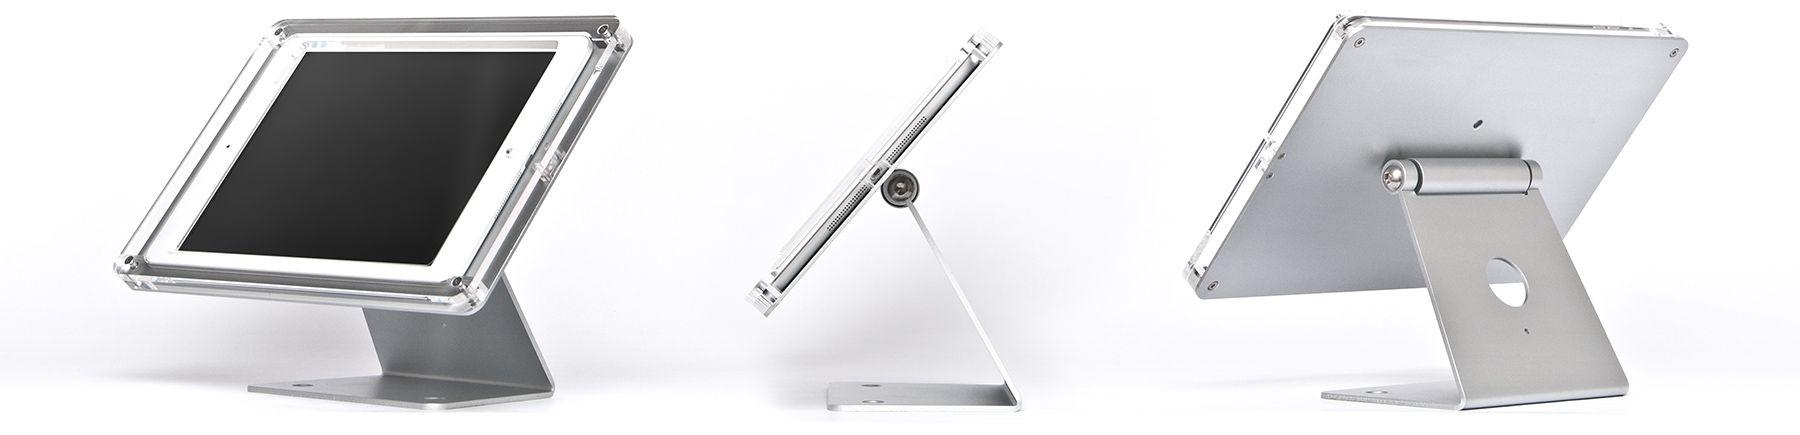 iPadスタンド「T1」